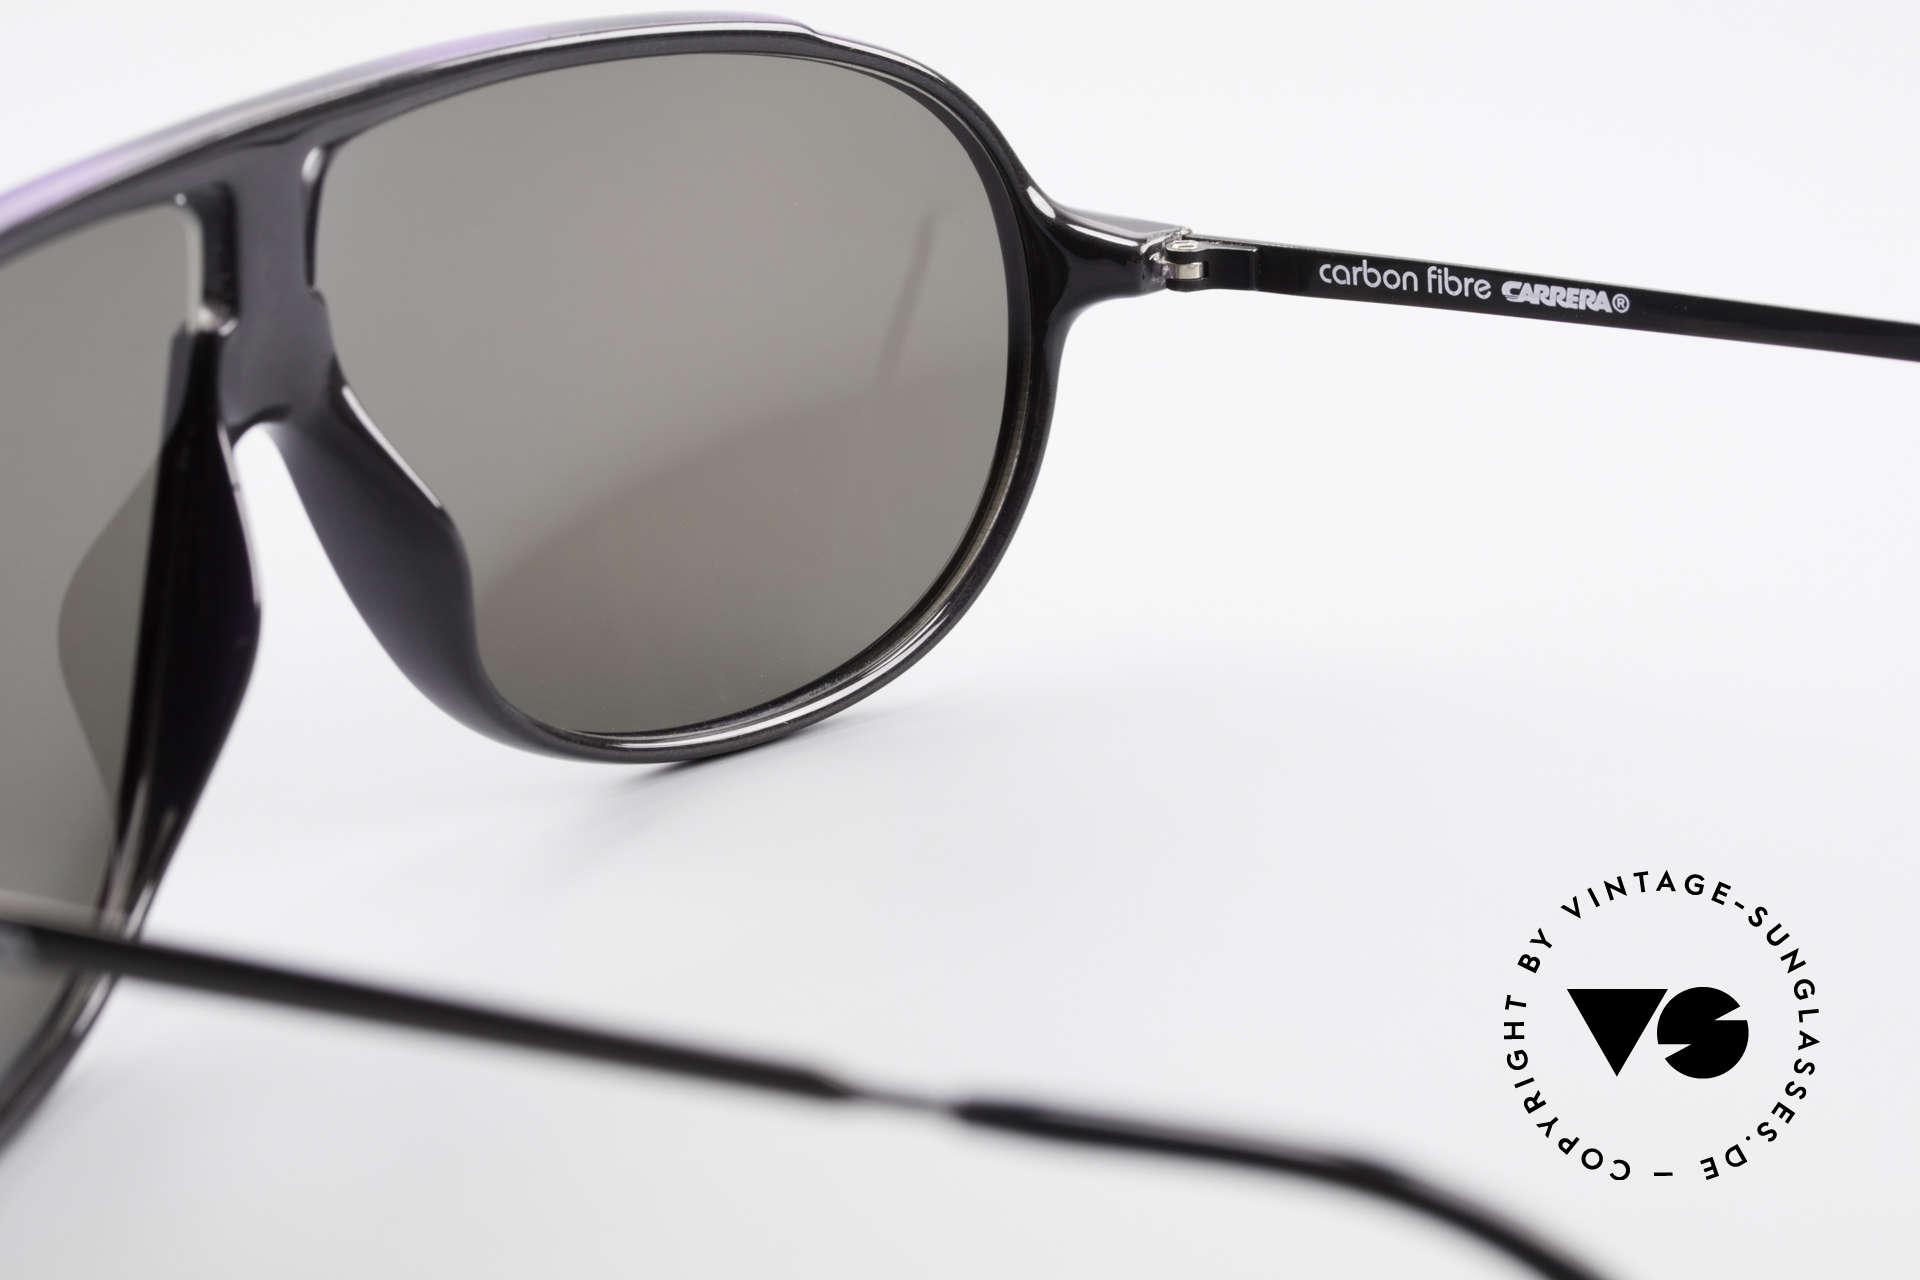 Carrera 5467 Carbon Fibre Shades Vintage, NO retro sunglasses but a unique and old original, Made for Men